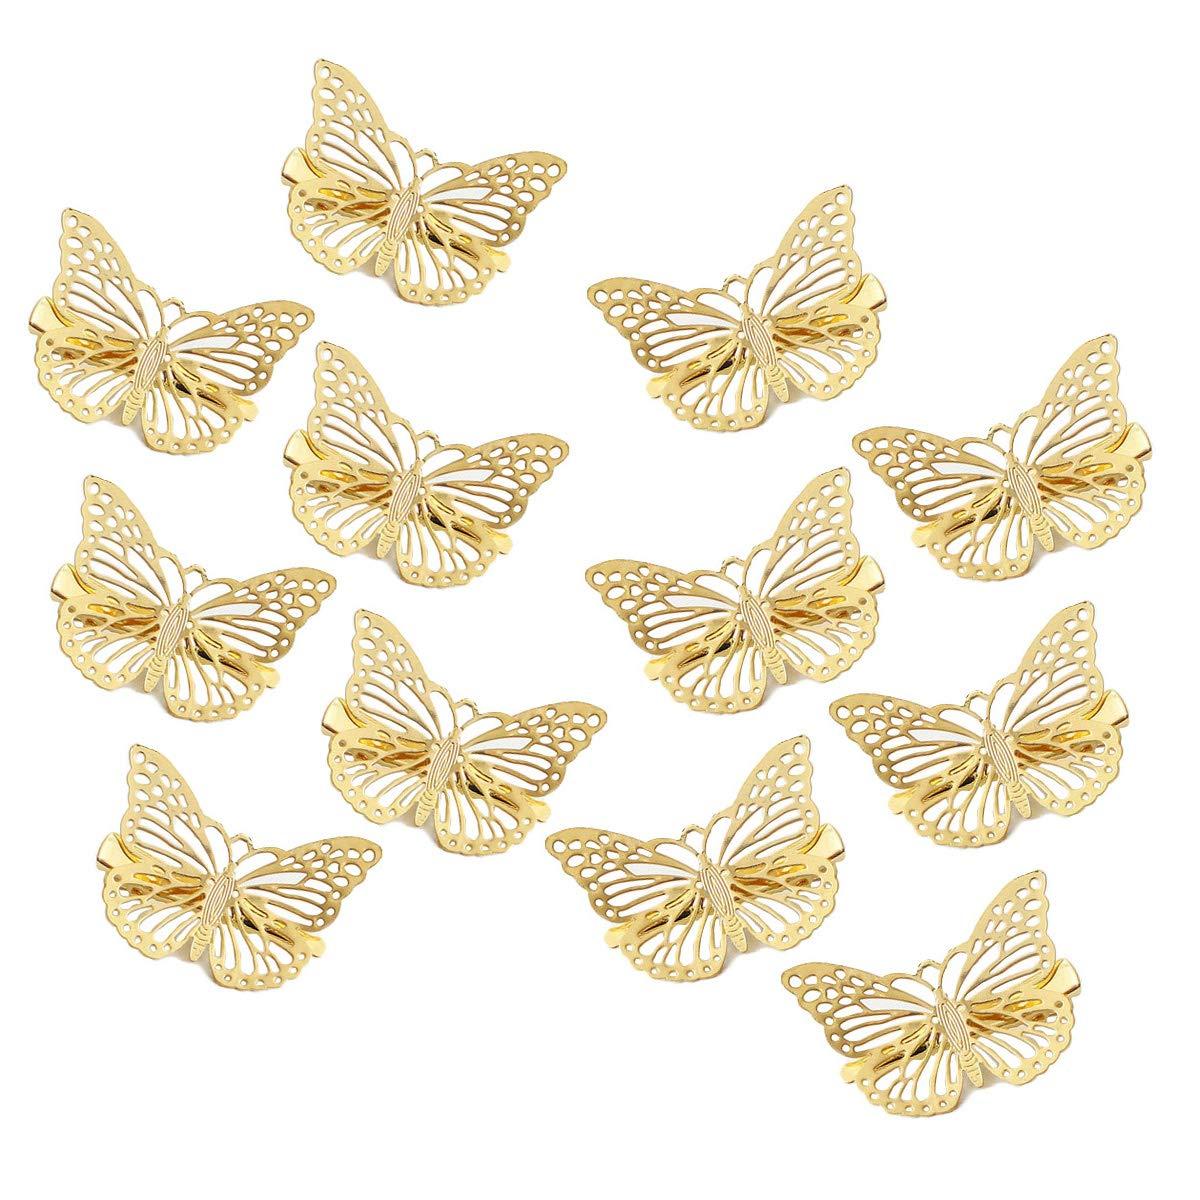 Gold Butterfly Hair Pins Imitation Bridal Jewelry Hair Clip Hair Accessories